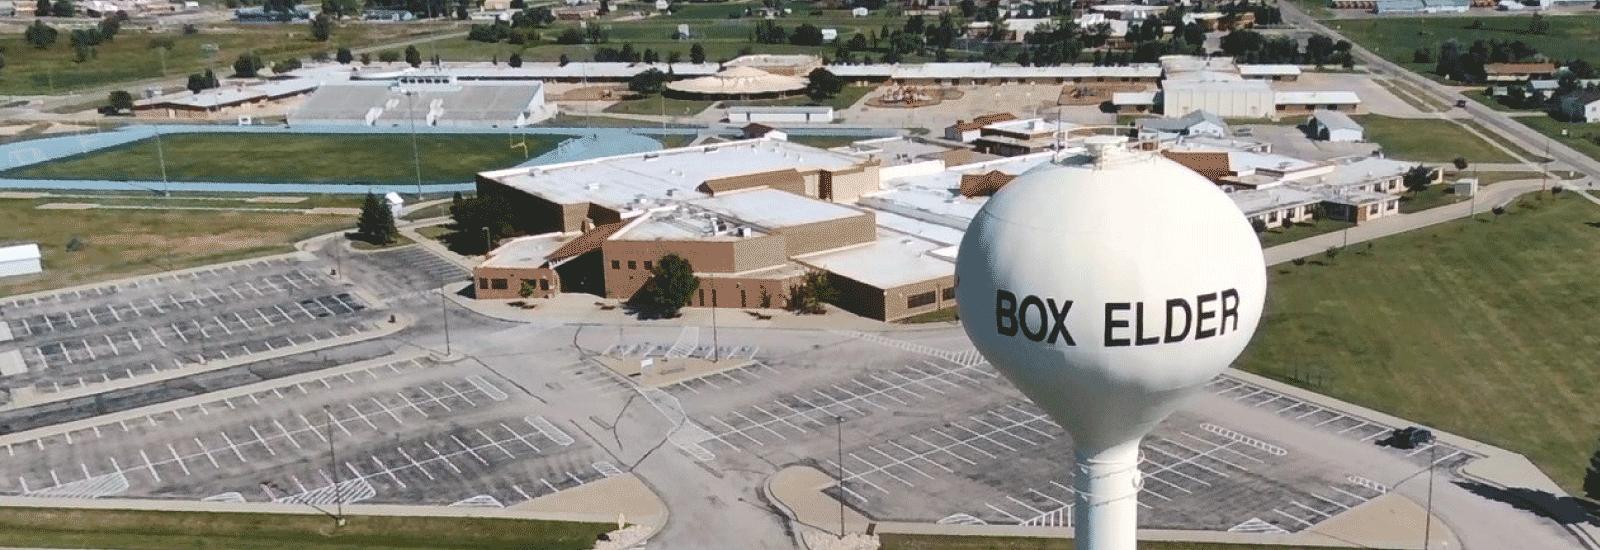 Douglas Public School District in Box Elder, SD